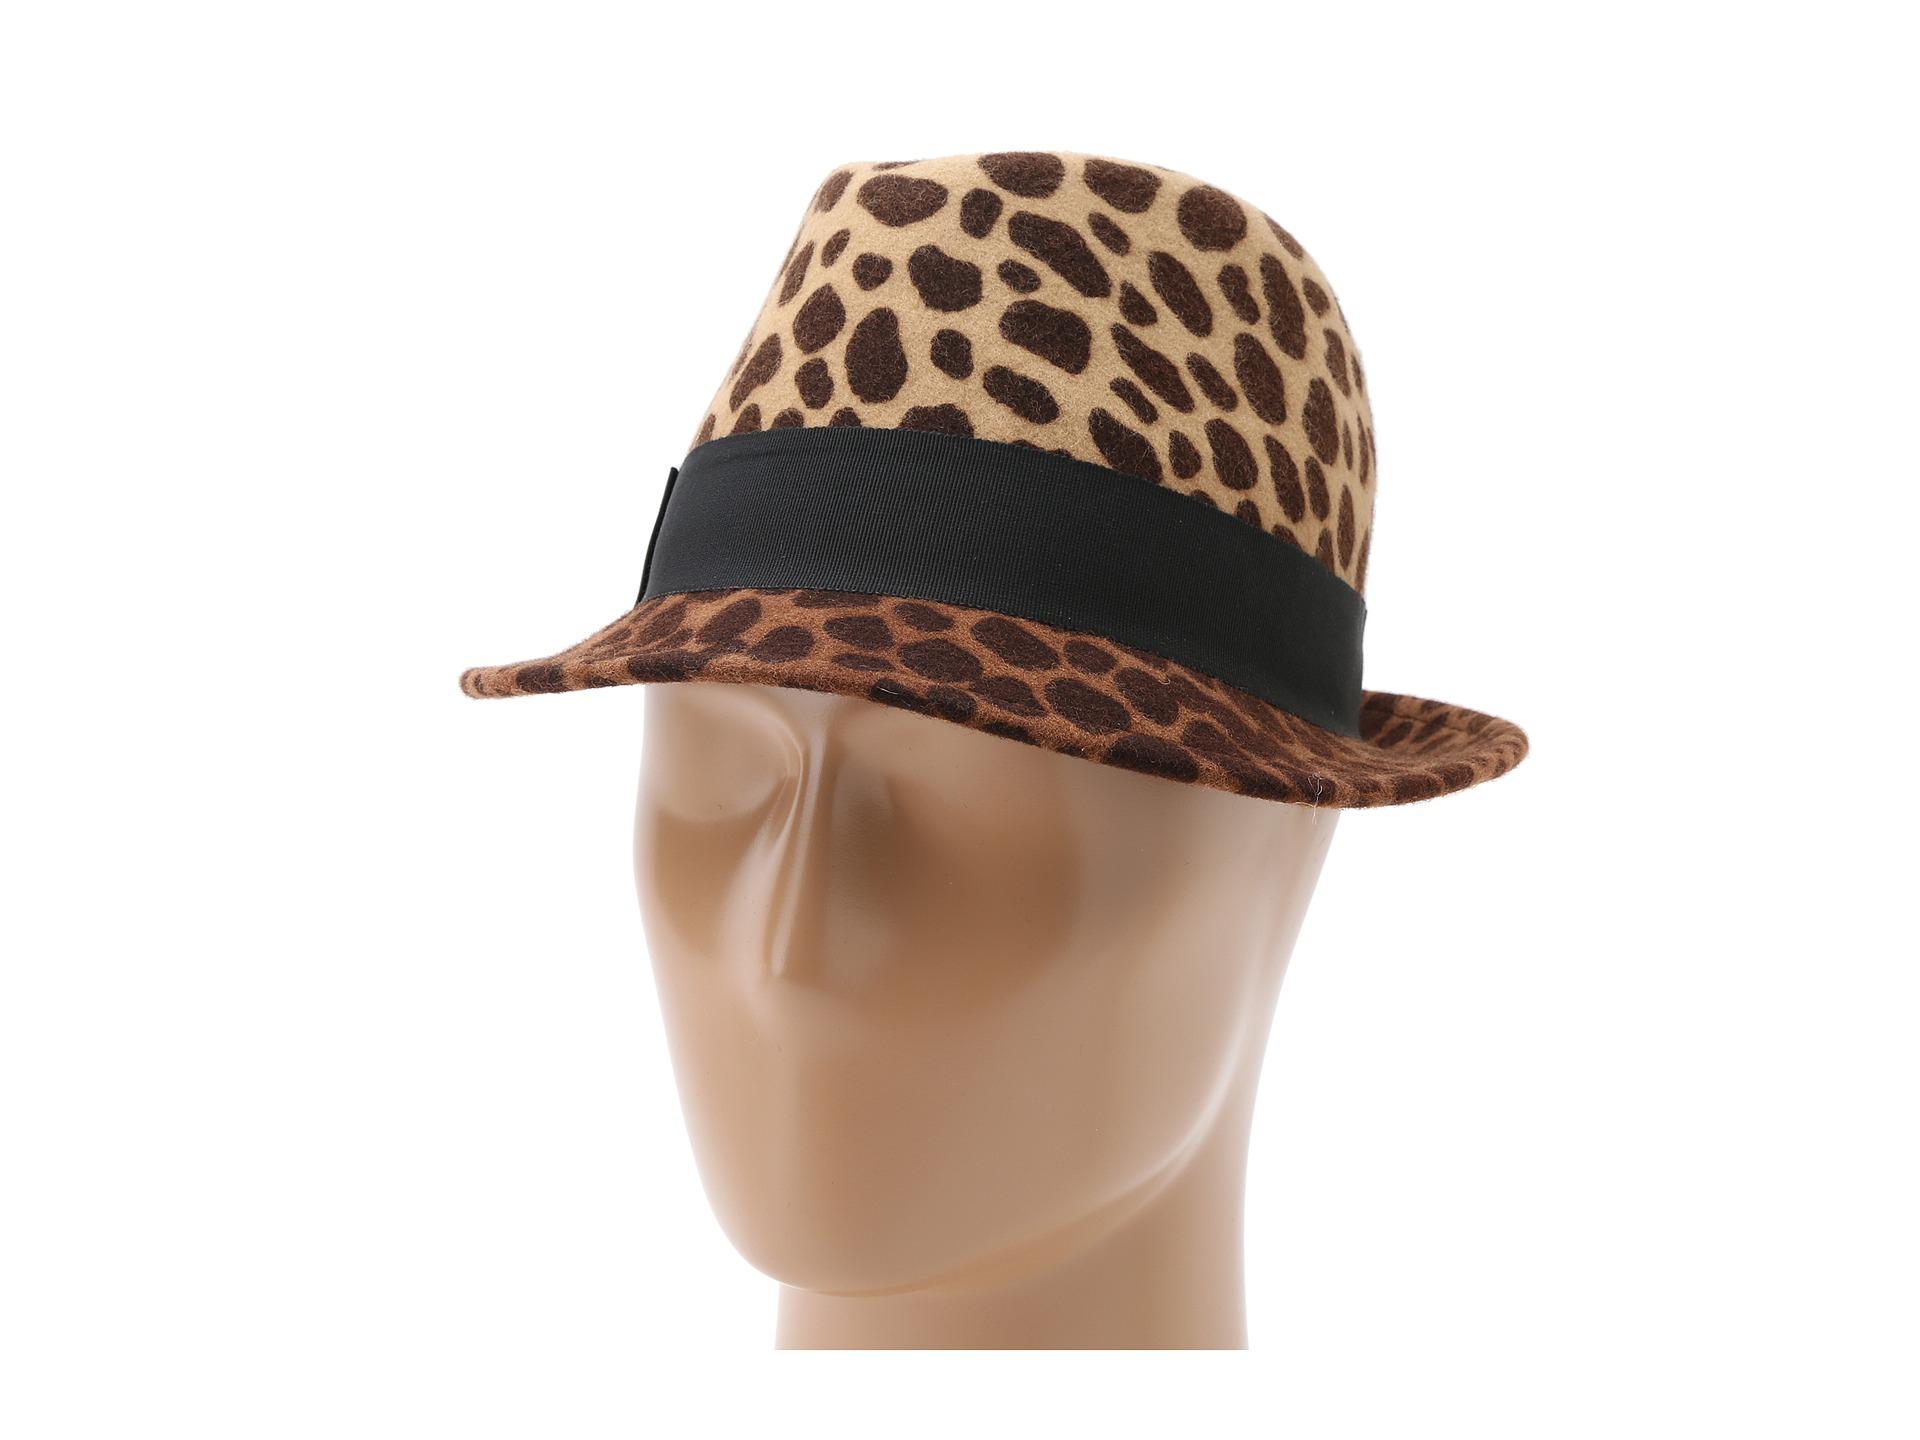 57ce15d332a82 Hat Attack Wool Felt Leopard Print Fedora - Lyst